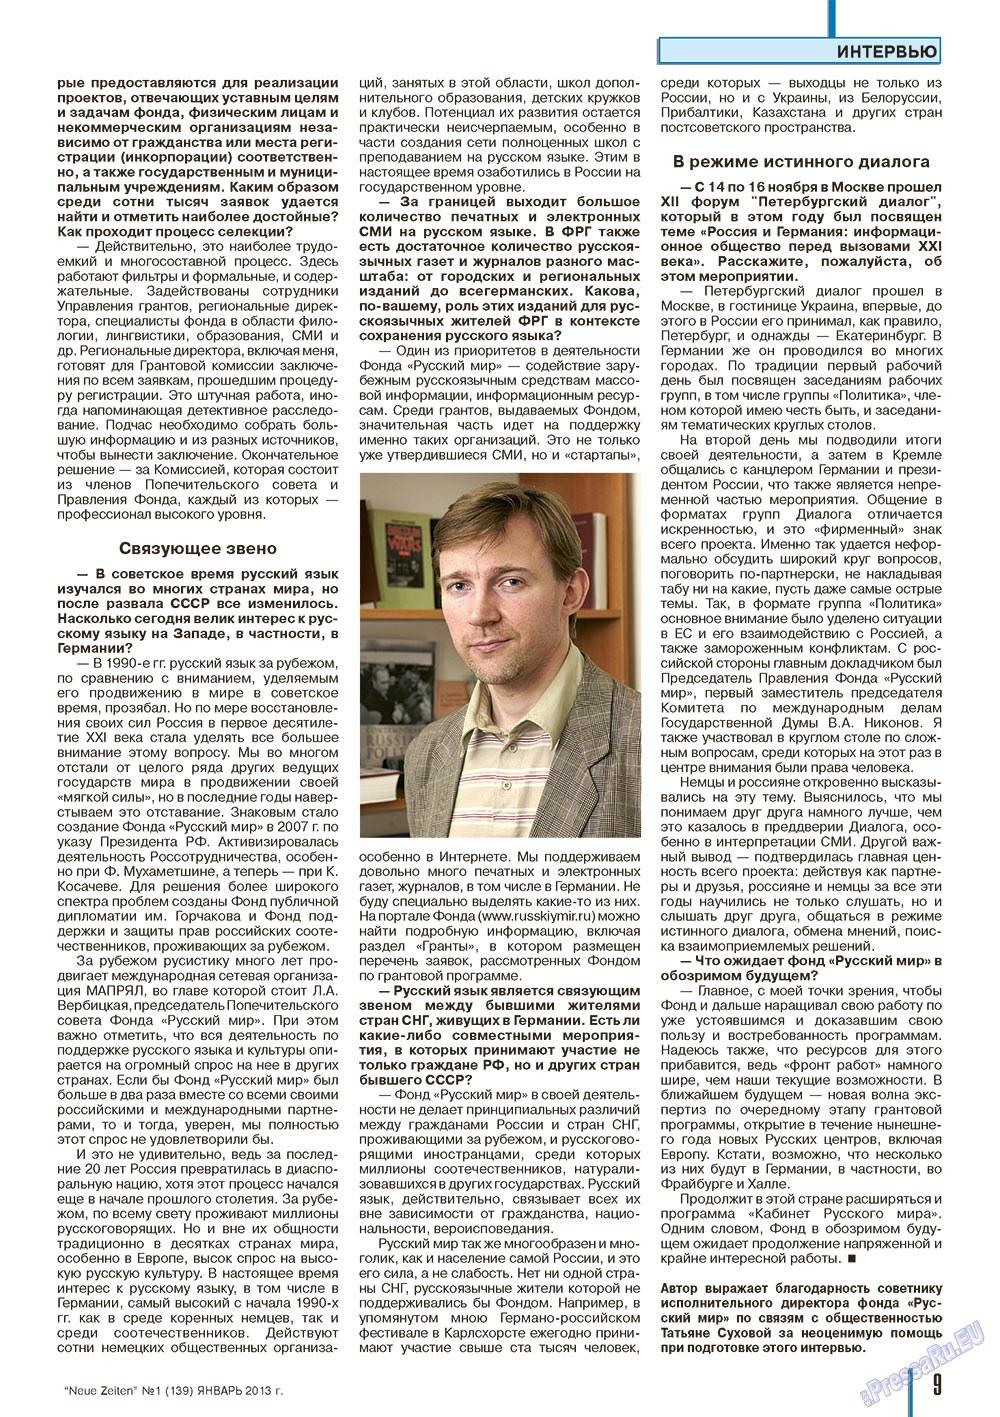 Neue Zeiten (журнал). 2013 год, номер 1, стр. 9